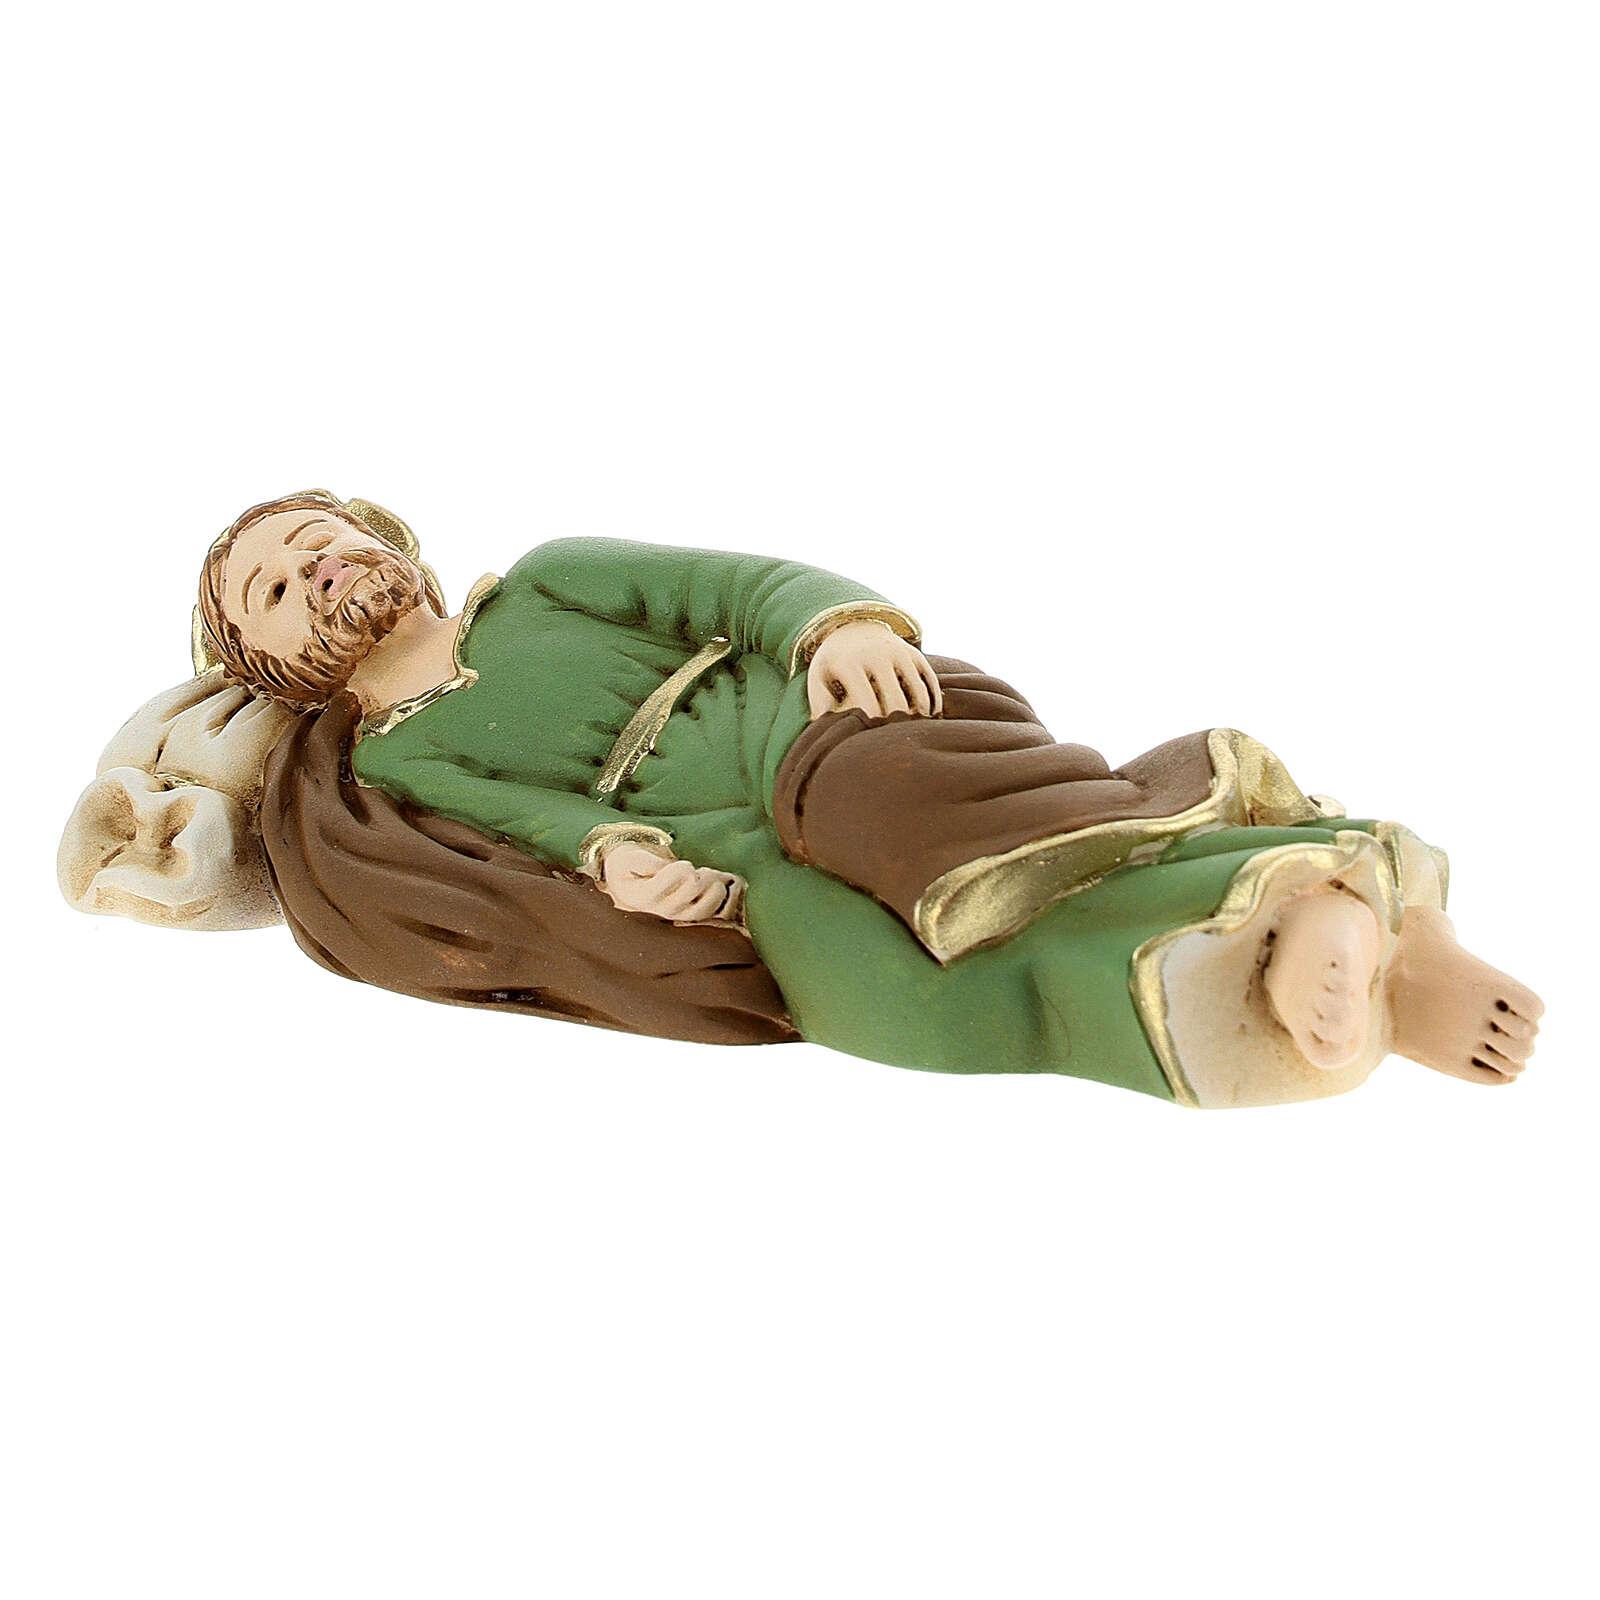 Estatua San José que duerme resina detalles dorados13,5 cm 4